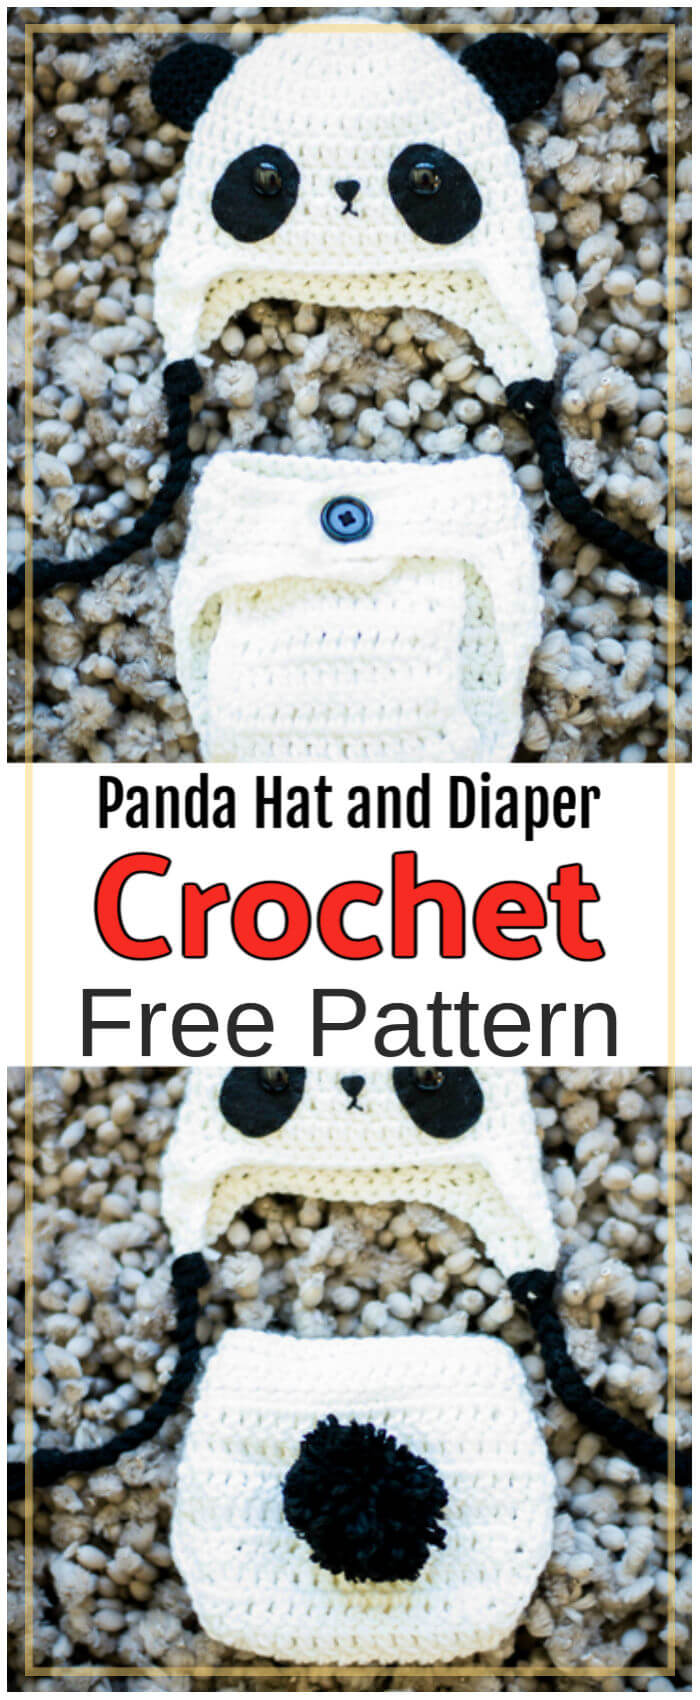 Free Crochet Panda Hat and Diaper Cover Pattern